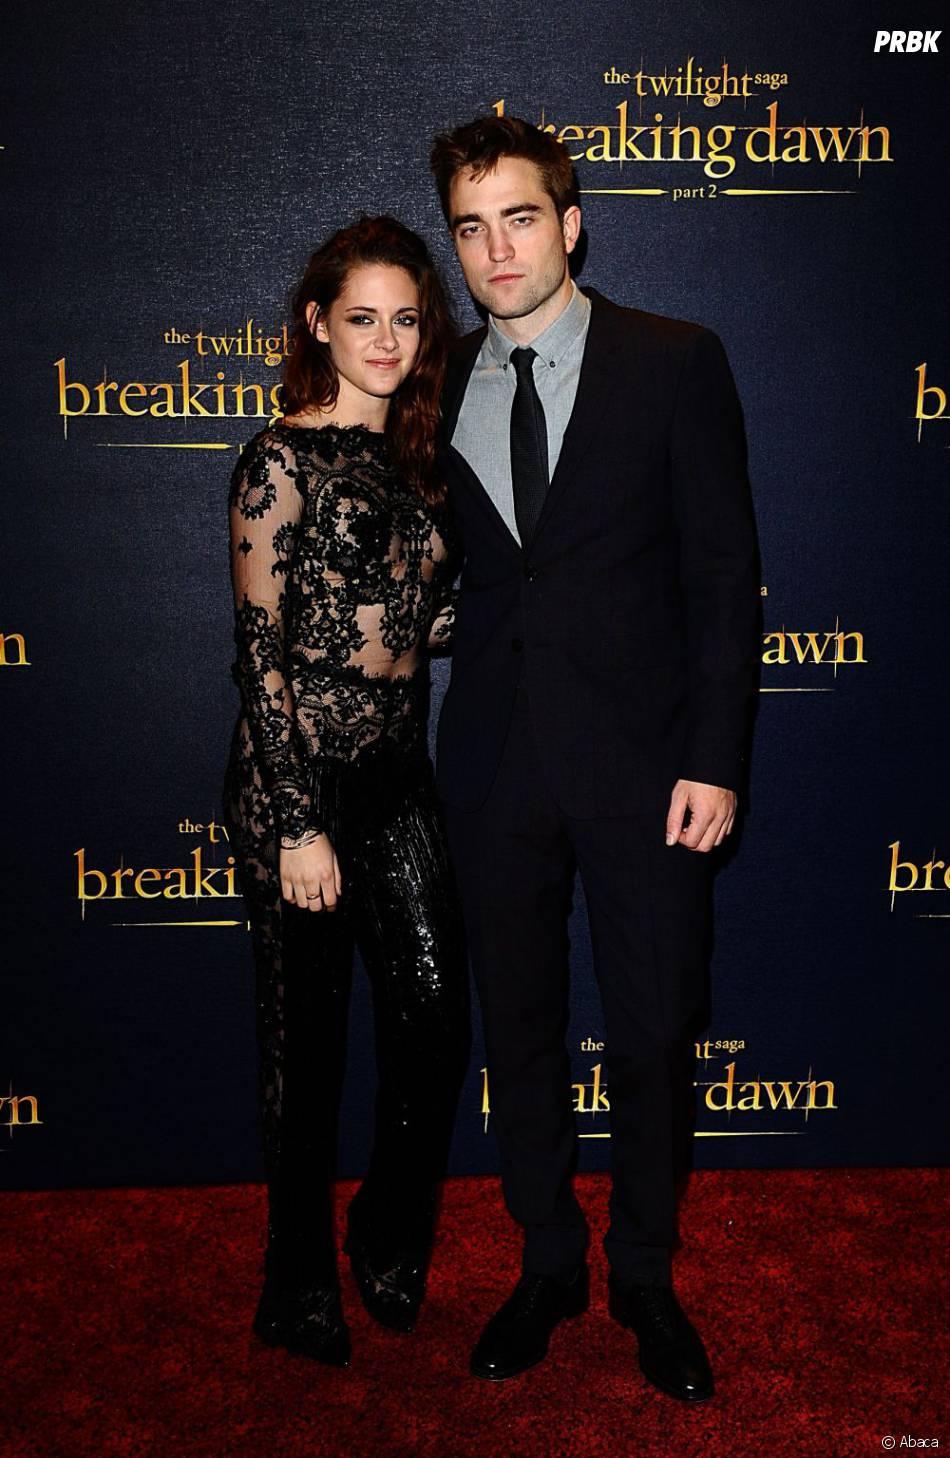 Robert Pattinson et Kristen Stewart sont nominés aux Teen Choice Awards 2013